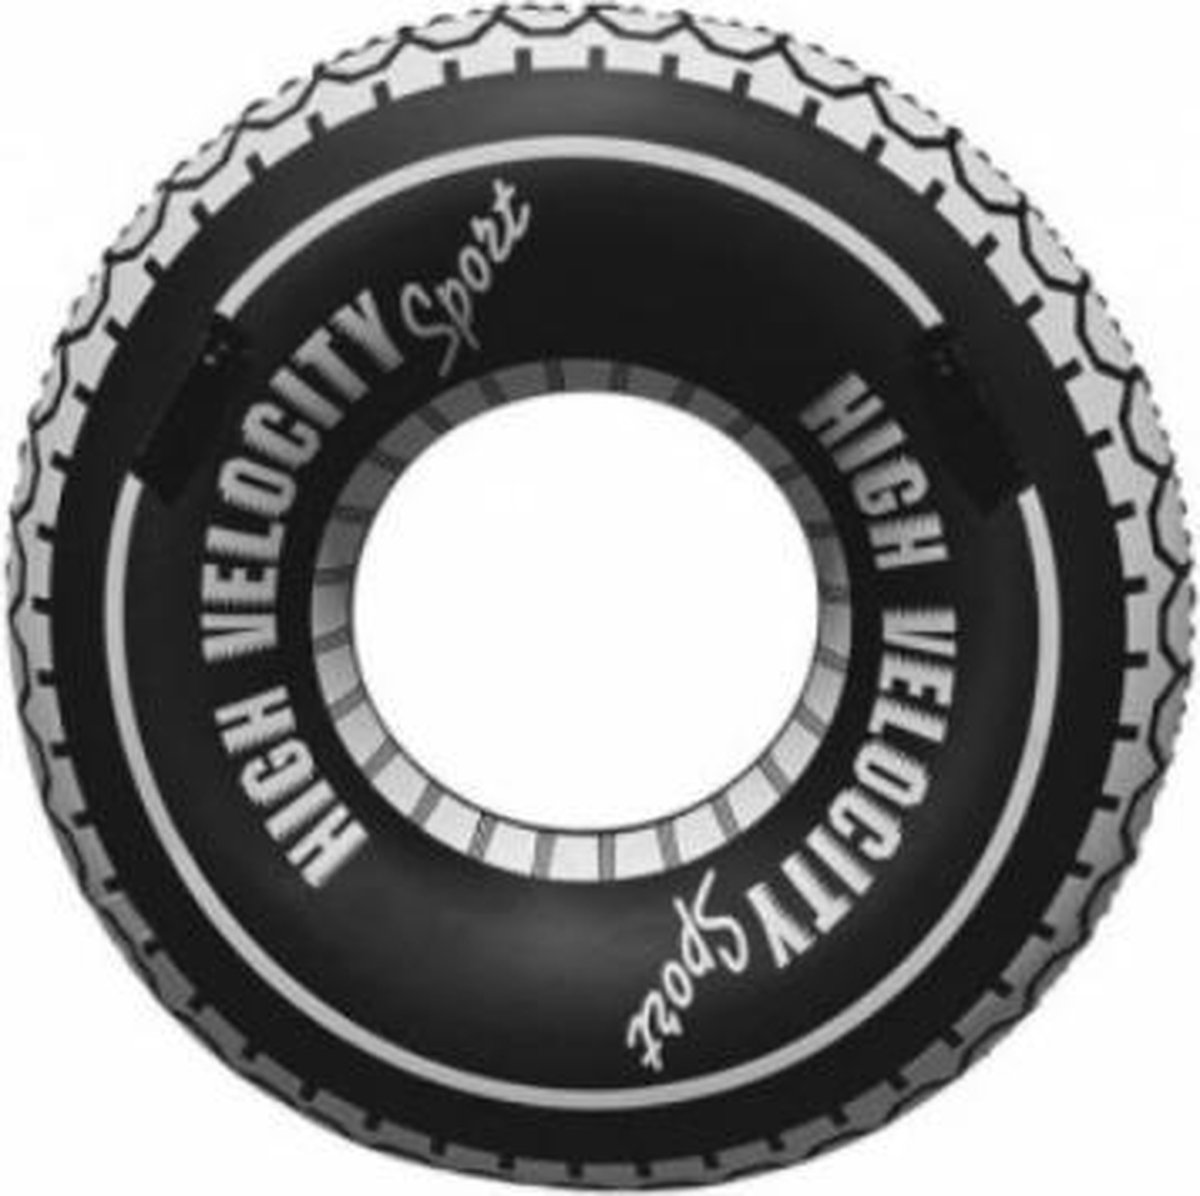 Opblaasbare Autoband| Zwemband Autoband| Giant Autoband| zwart/wit/grijs| 90 cm